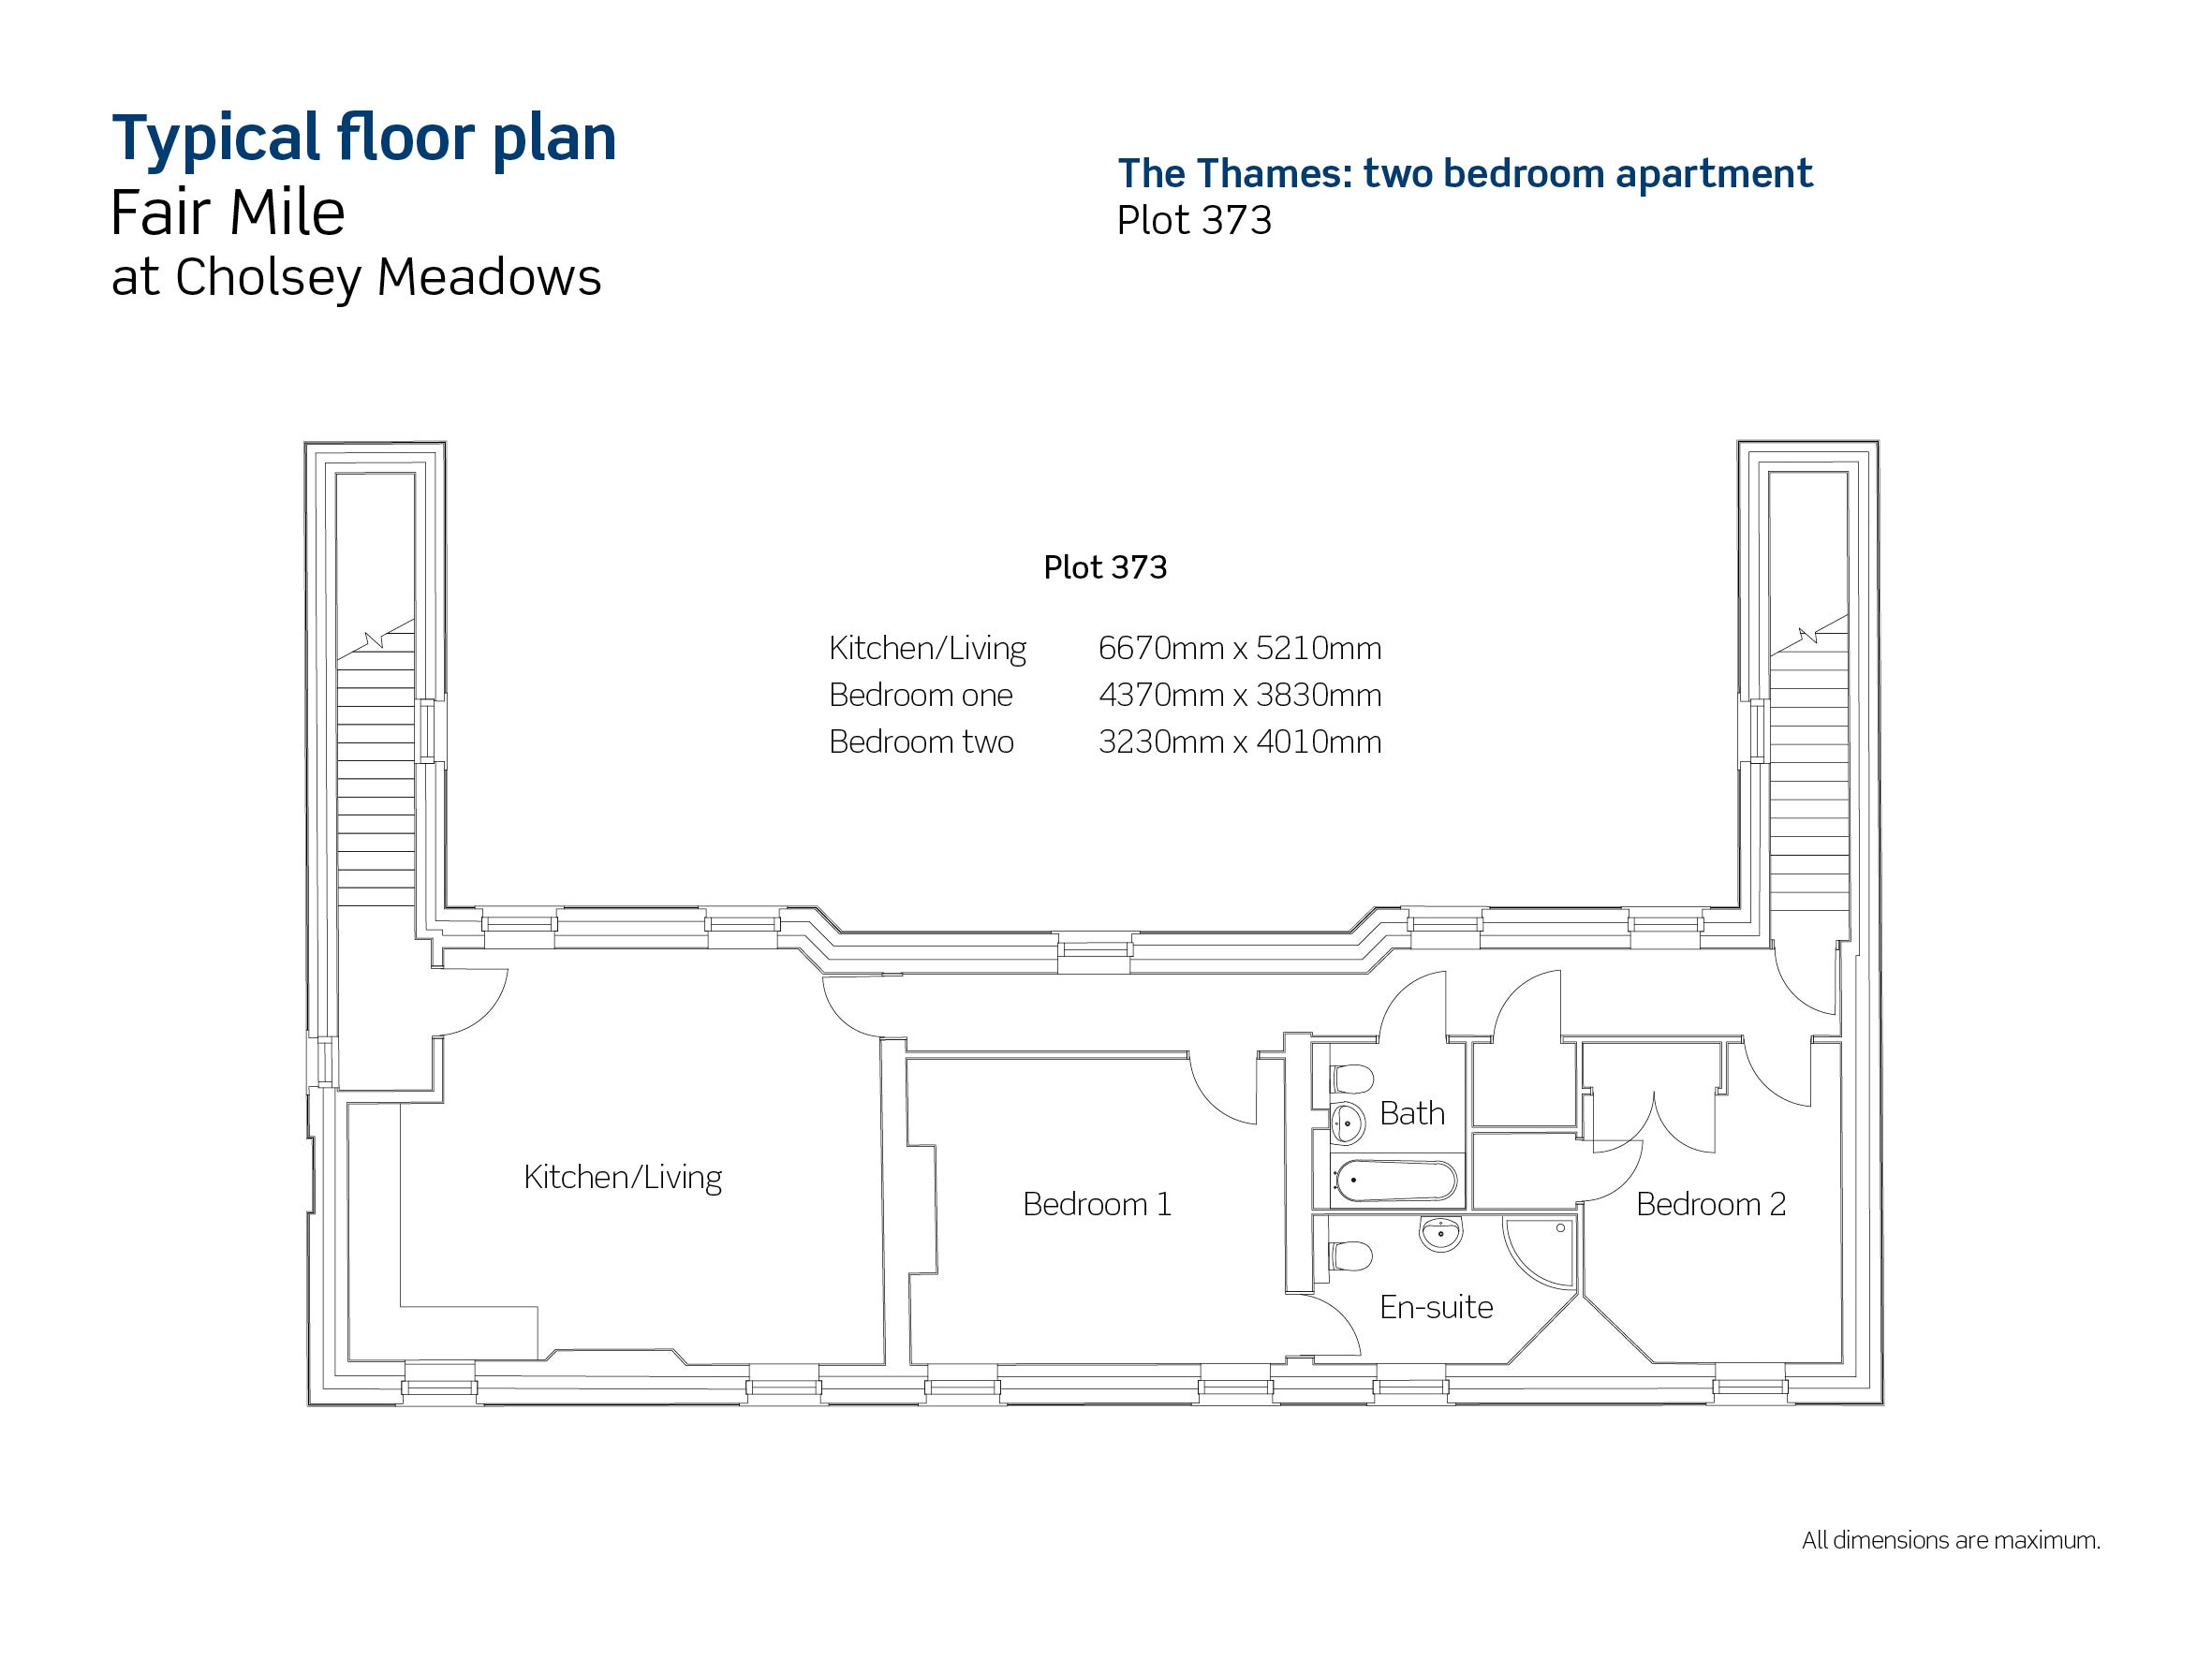 Fair Mile at Cholsey Meadows plot 373 floor plan